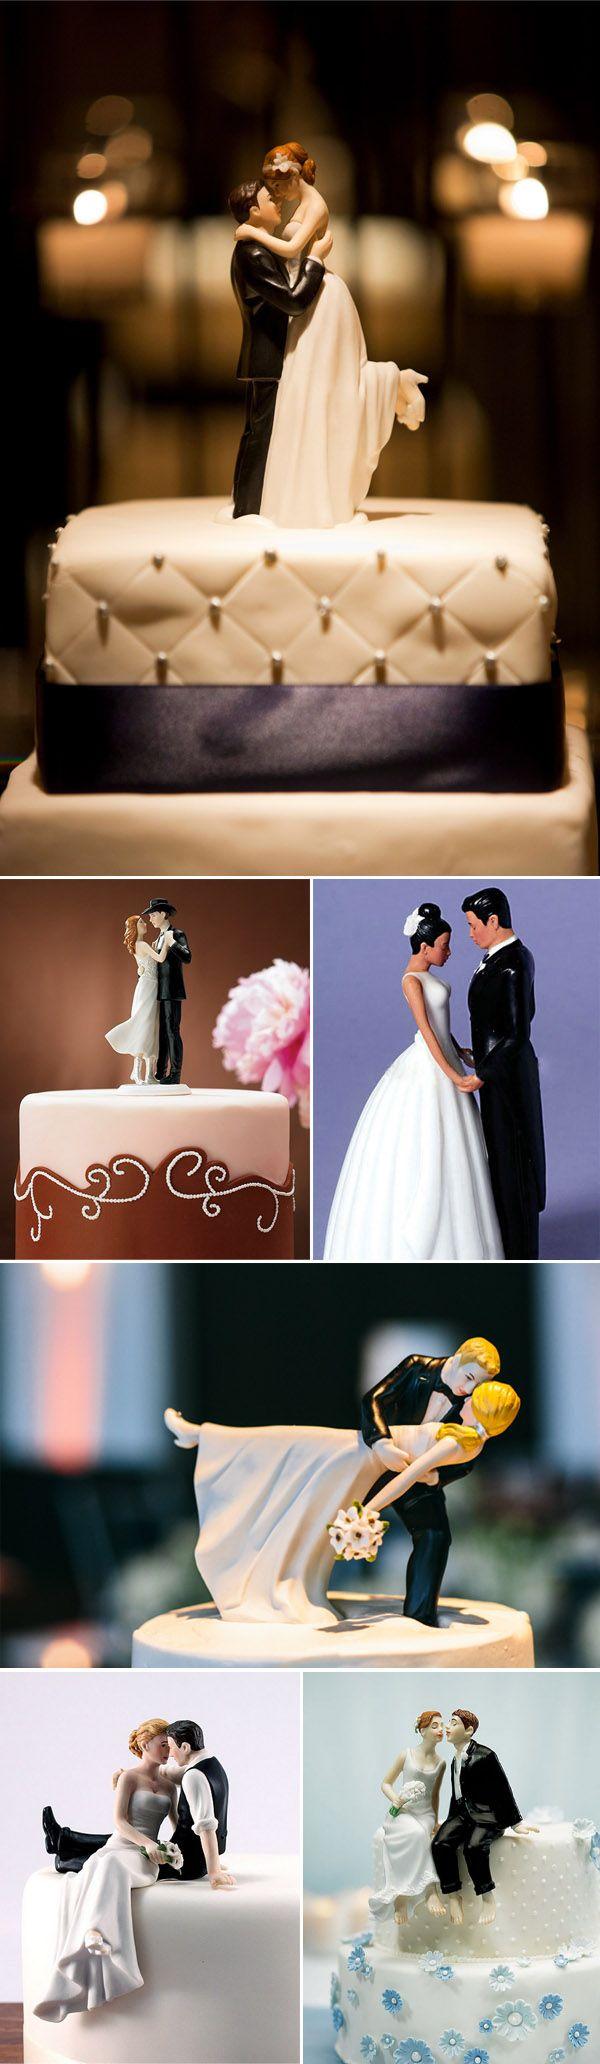 romantic bride and groom wedding cake topper ideas